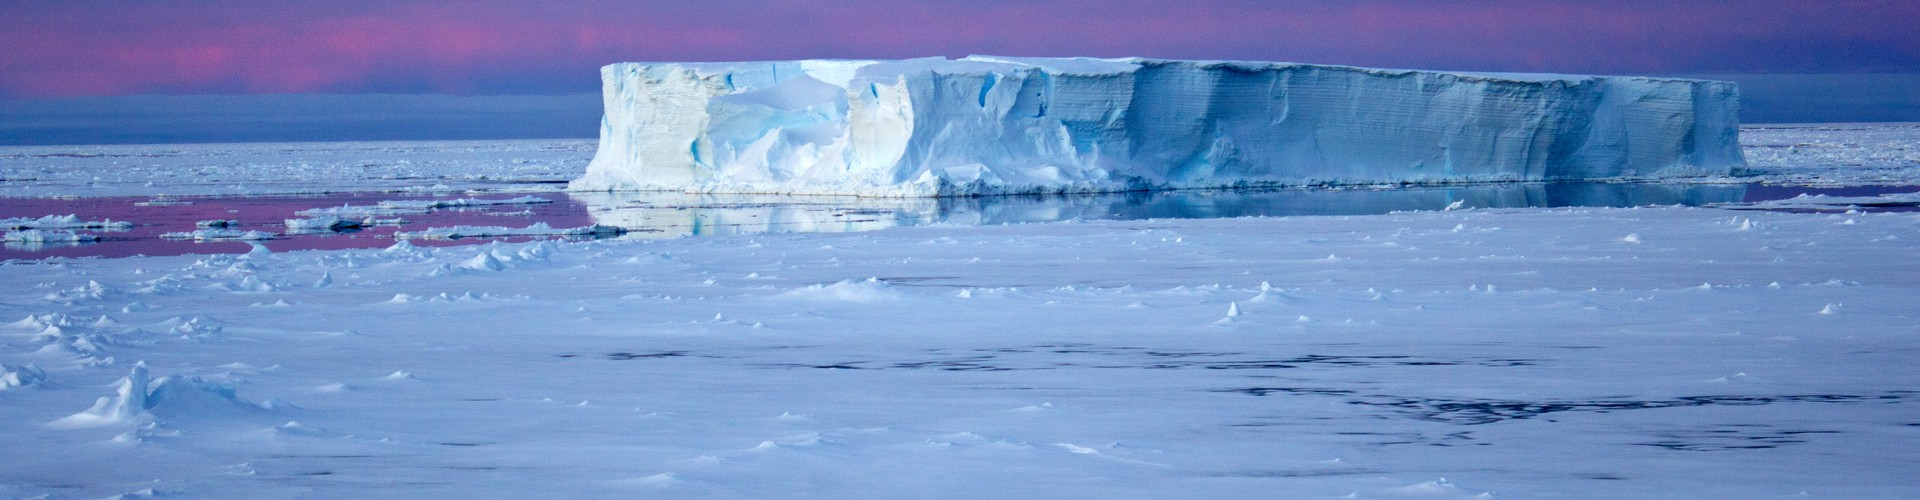 Iceberg surrounded by sea ice in the Antarctic (Credit: Eva Nowatzki, distributed via imaggeo.egu.eu)